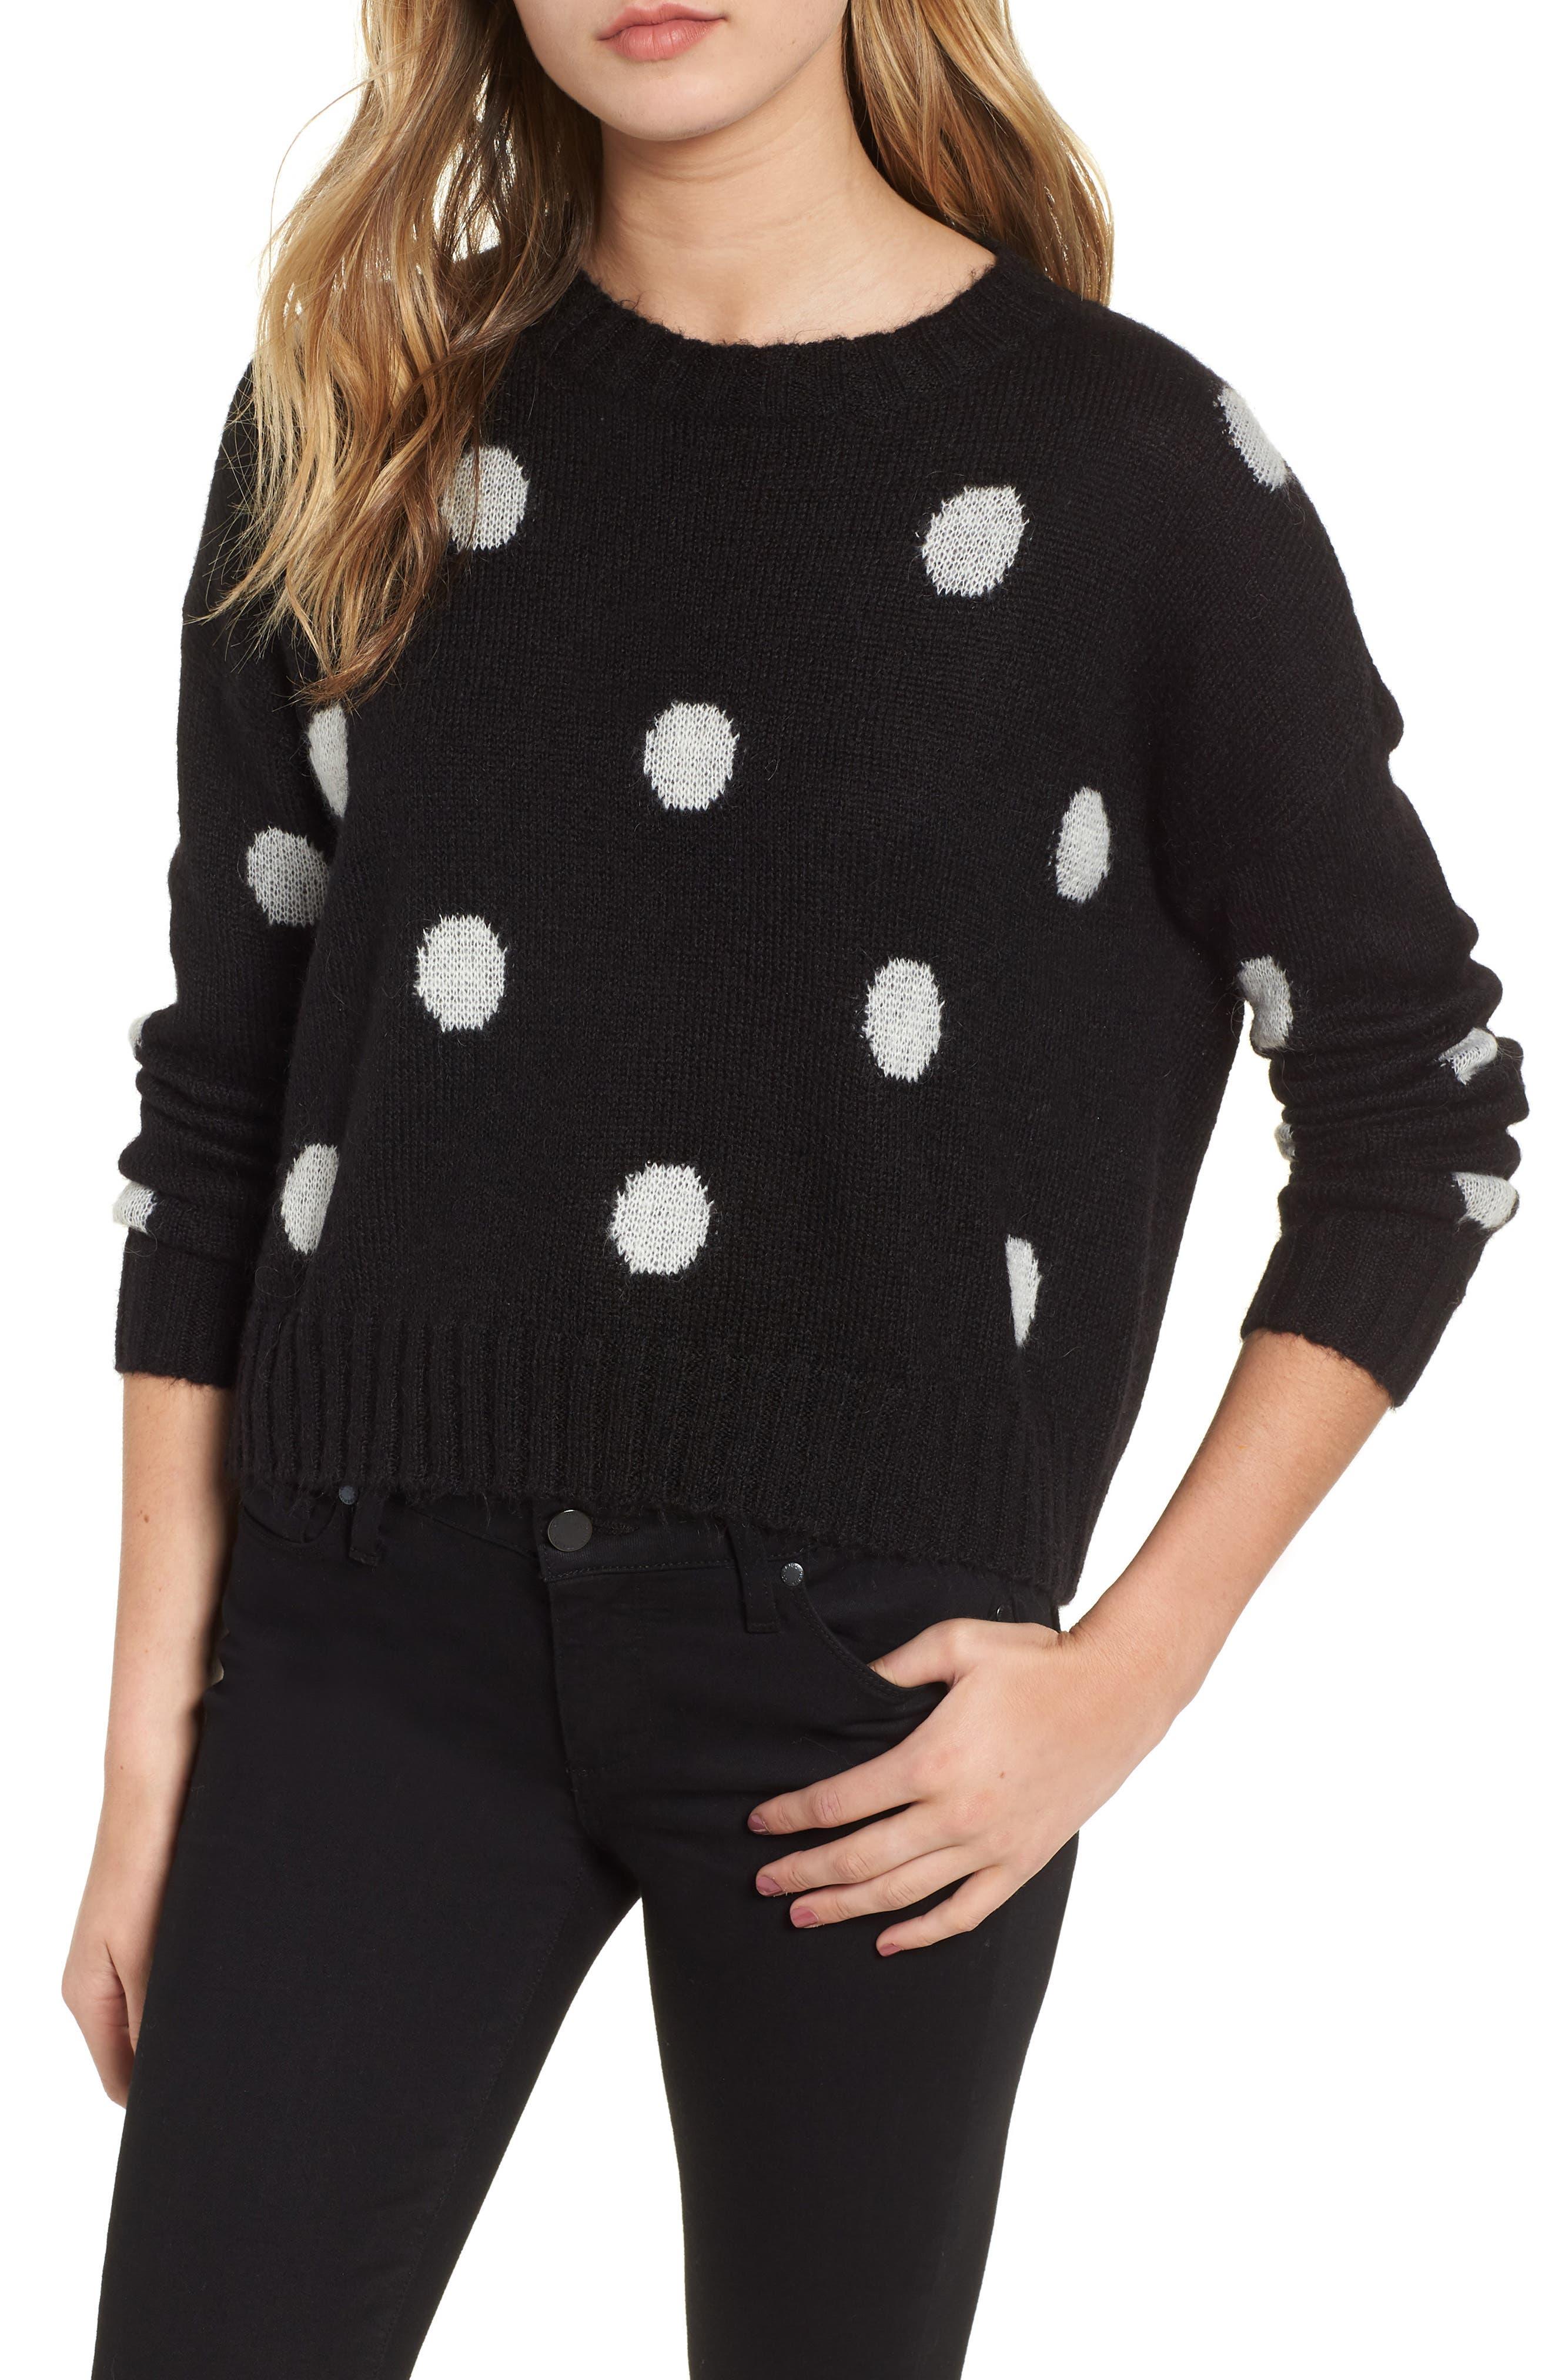 Perci Sweater,                         Main,                         color, BLACK/ IVORY POLKA DOT